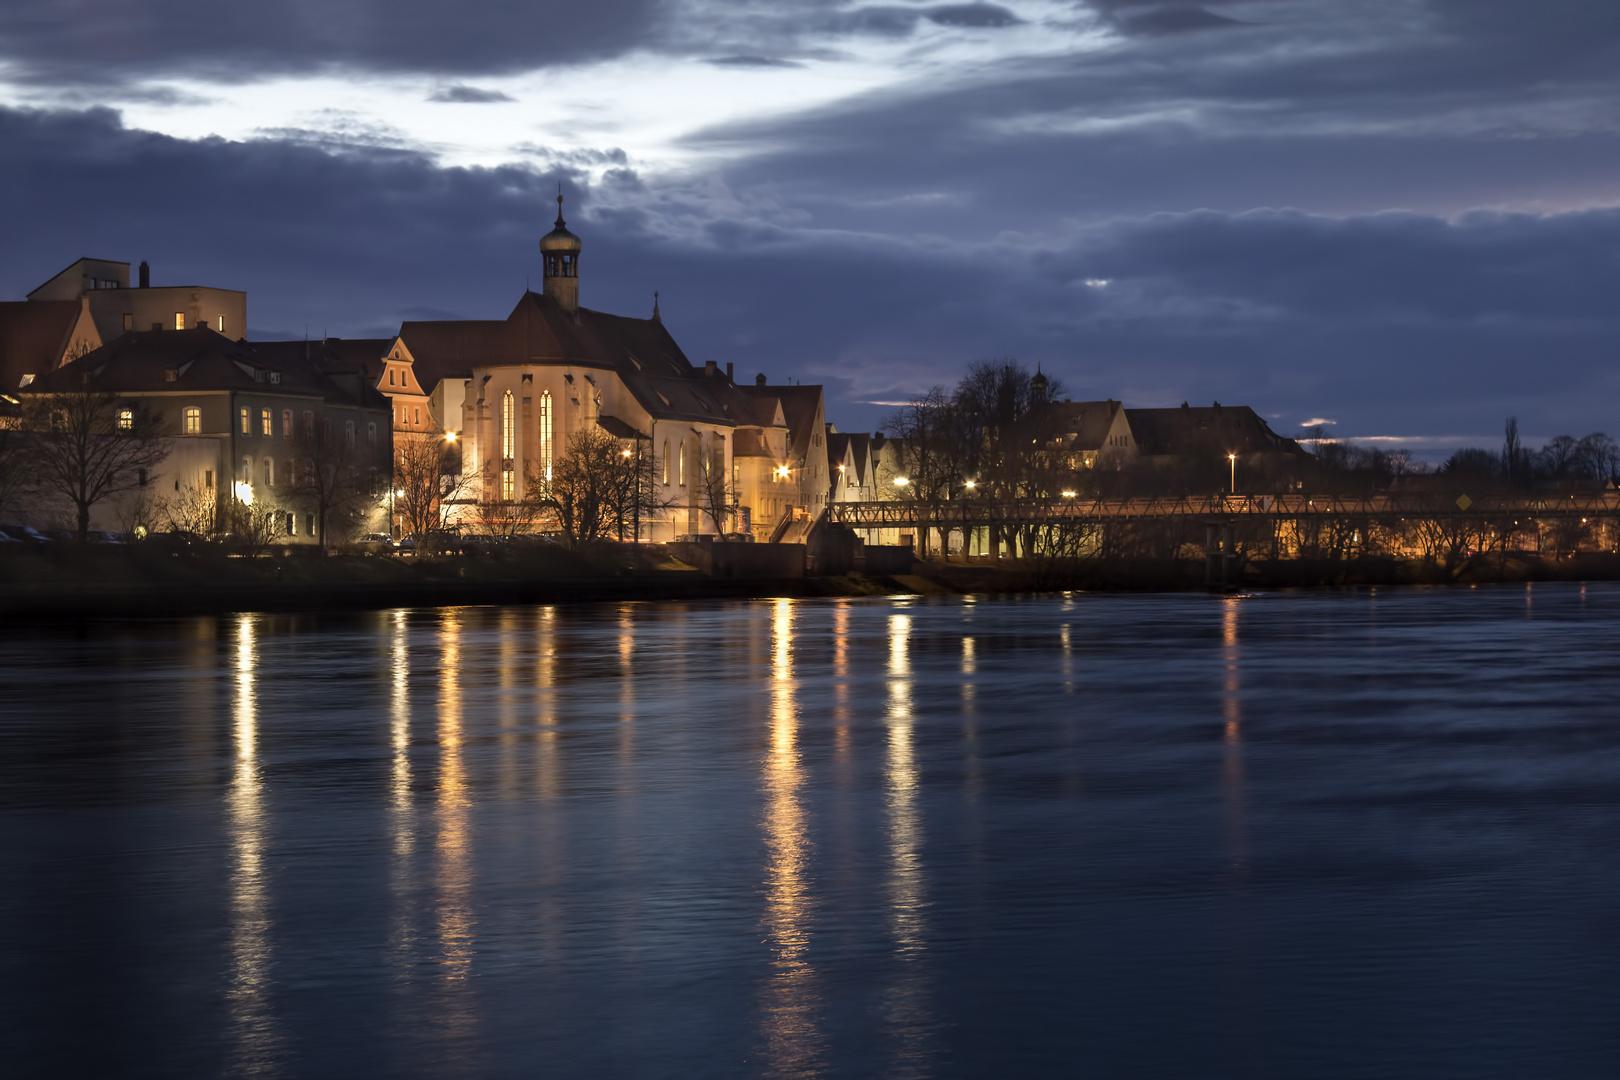 Regensburg - St. Oswald